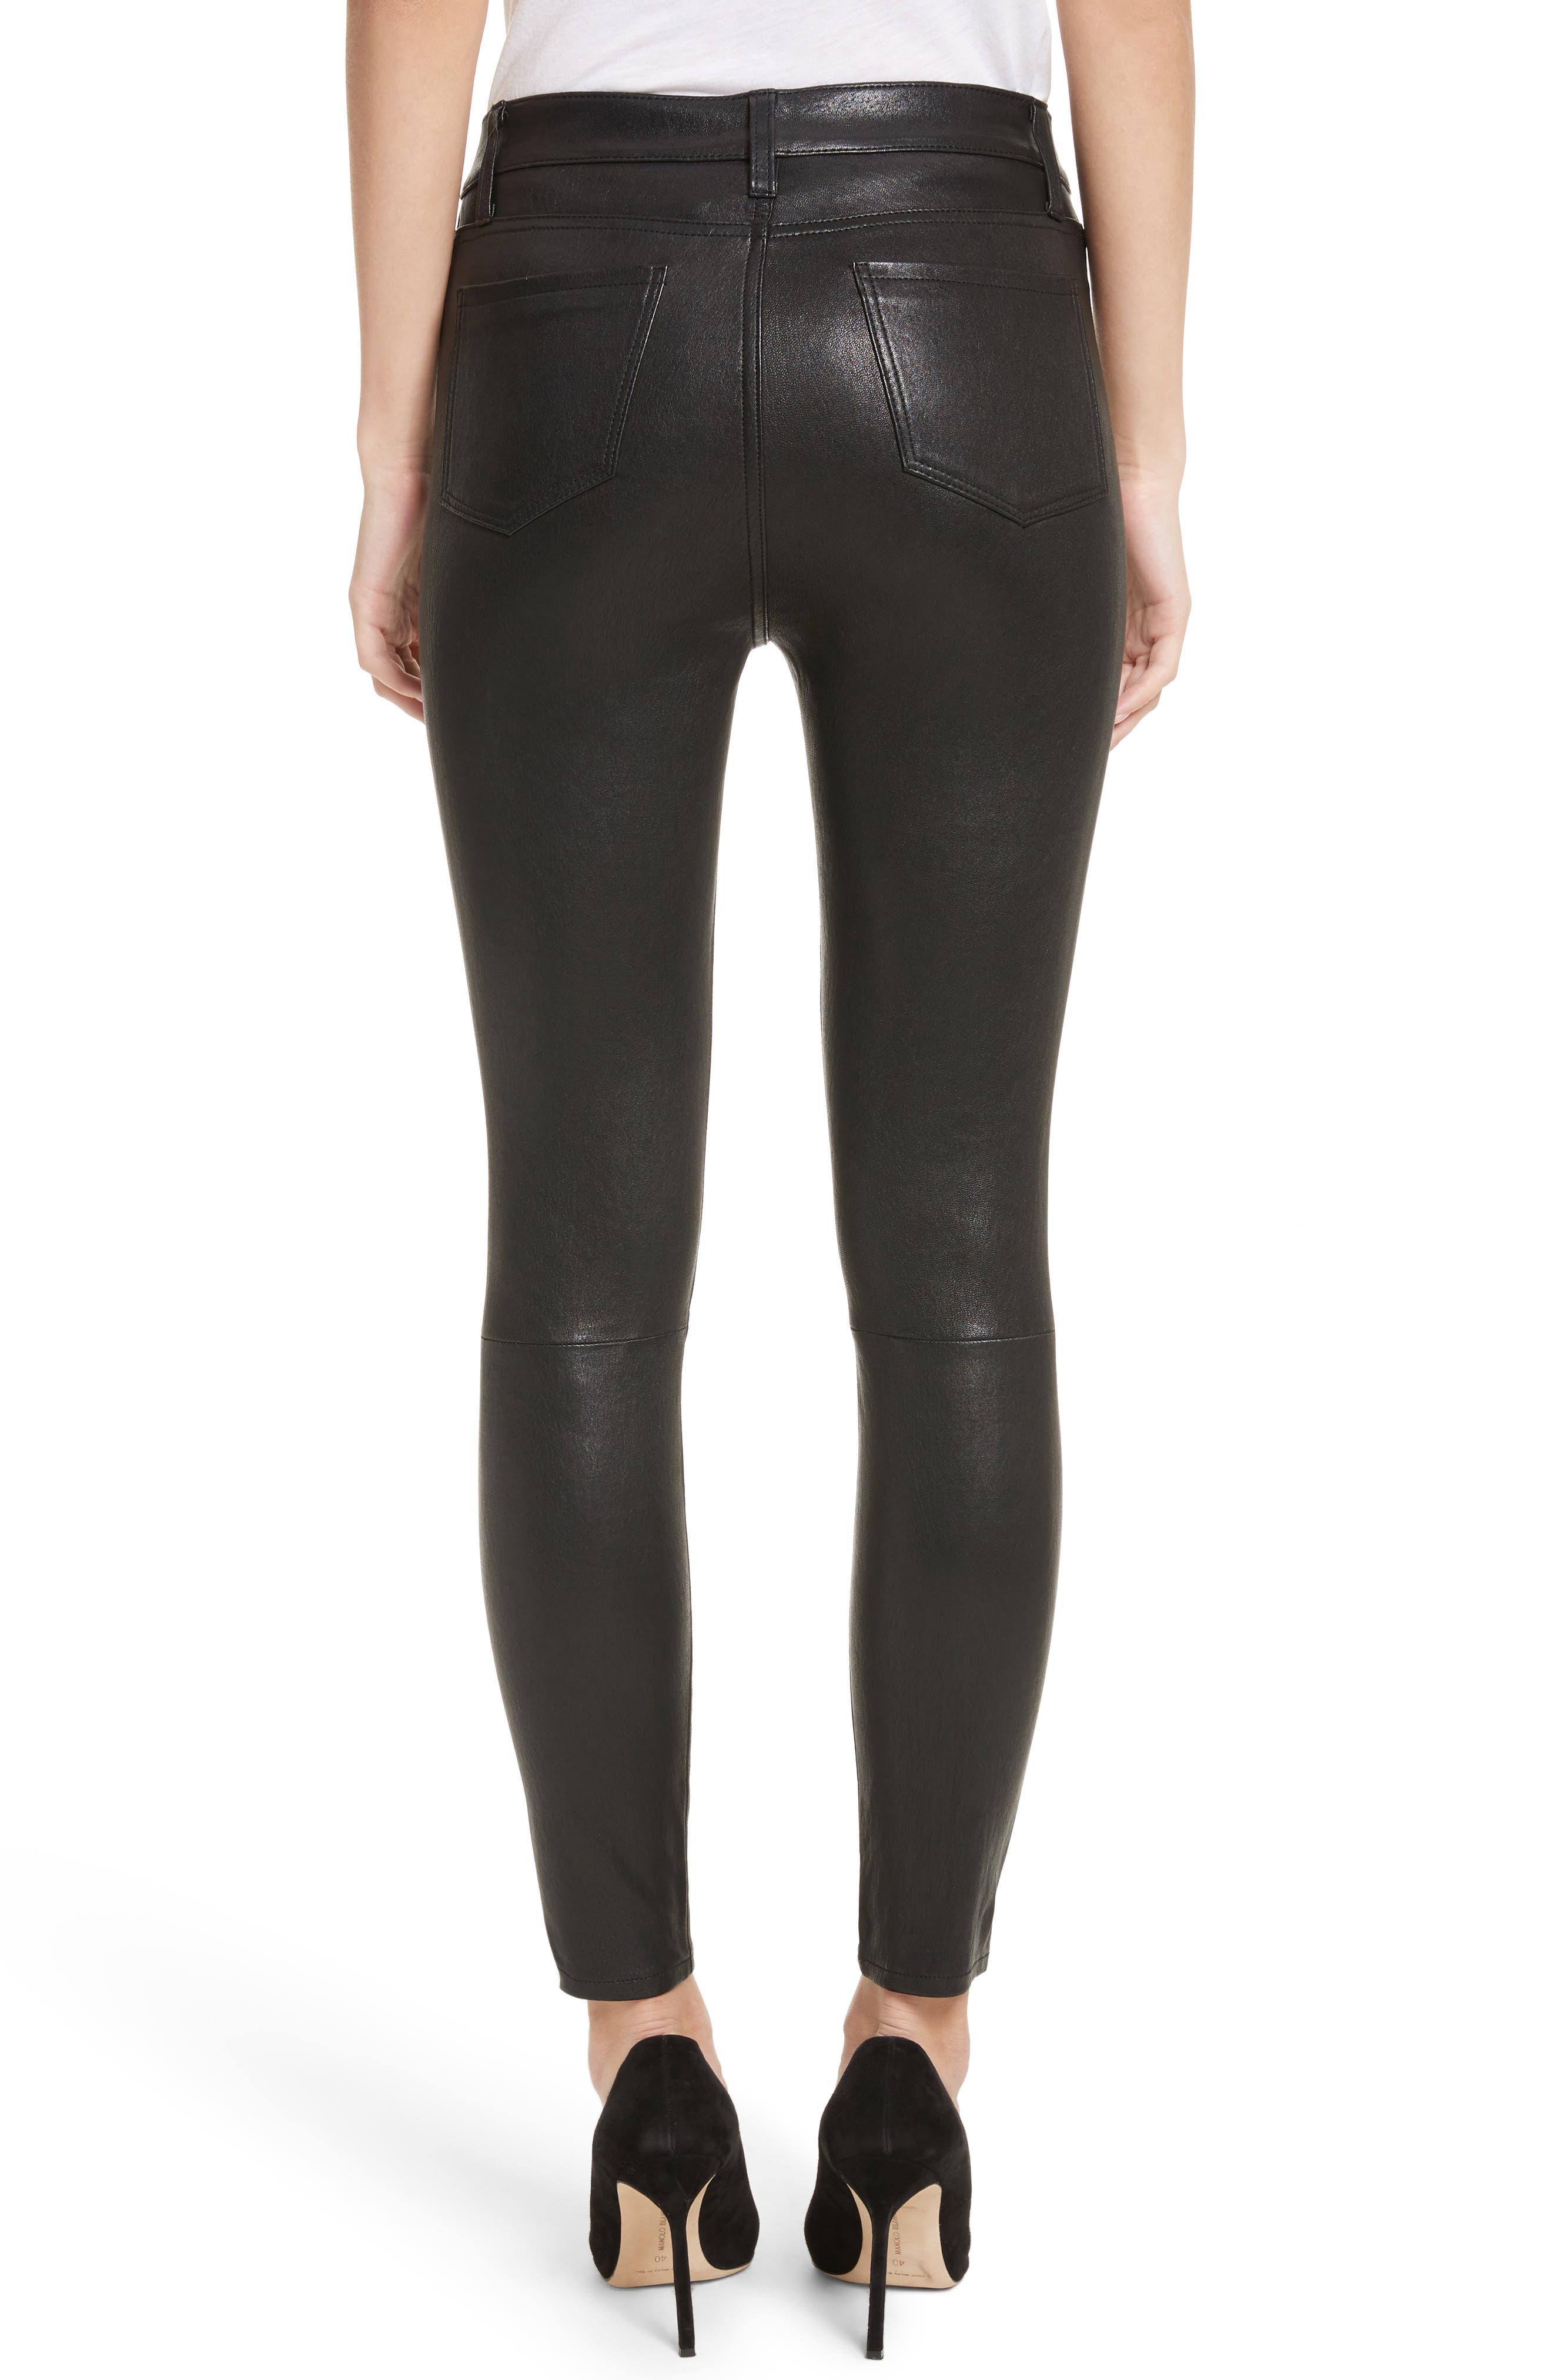 LAGENCE Adelaide High Waist Crop Leather Jeans,                             Alternate thumbnail 2, color,                             Noir